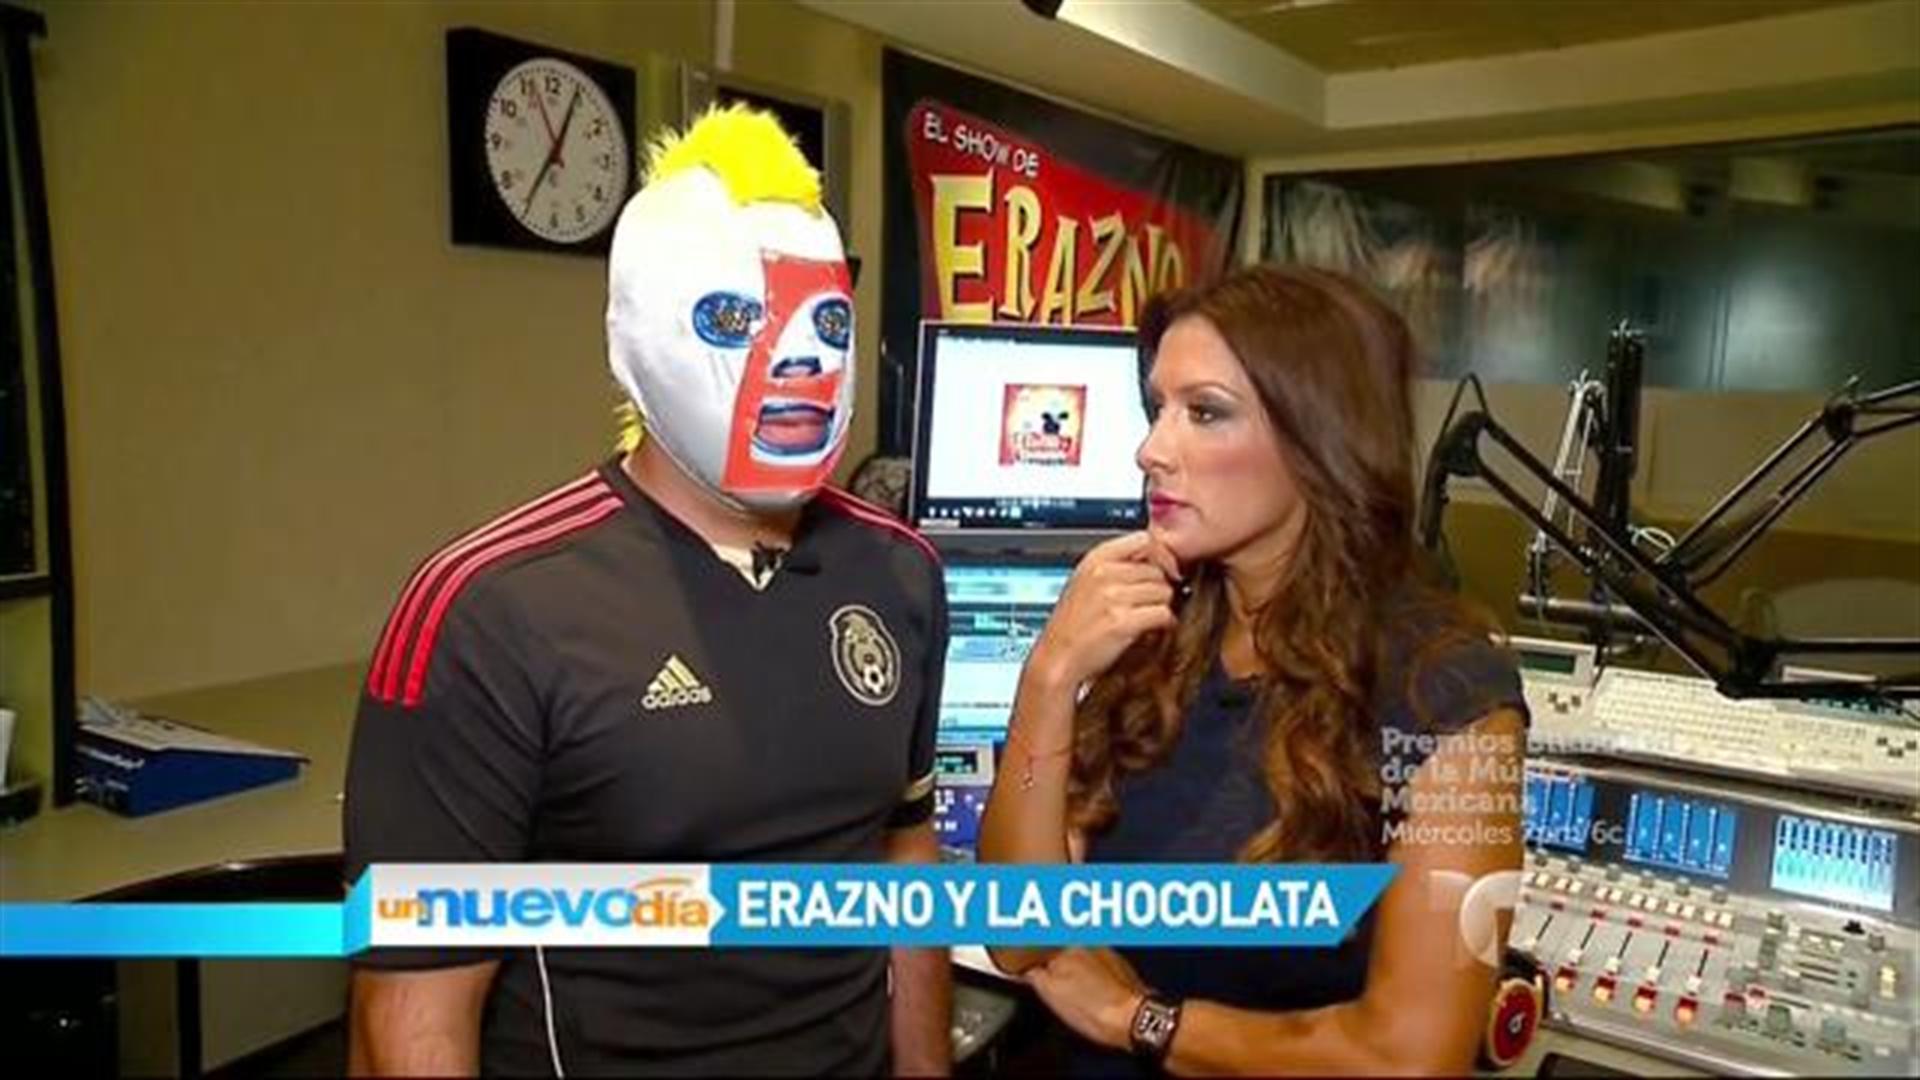 Oswaldo Daz: Erazno, la Chokolata y muchos ms - Radionotas 35